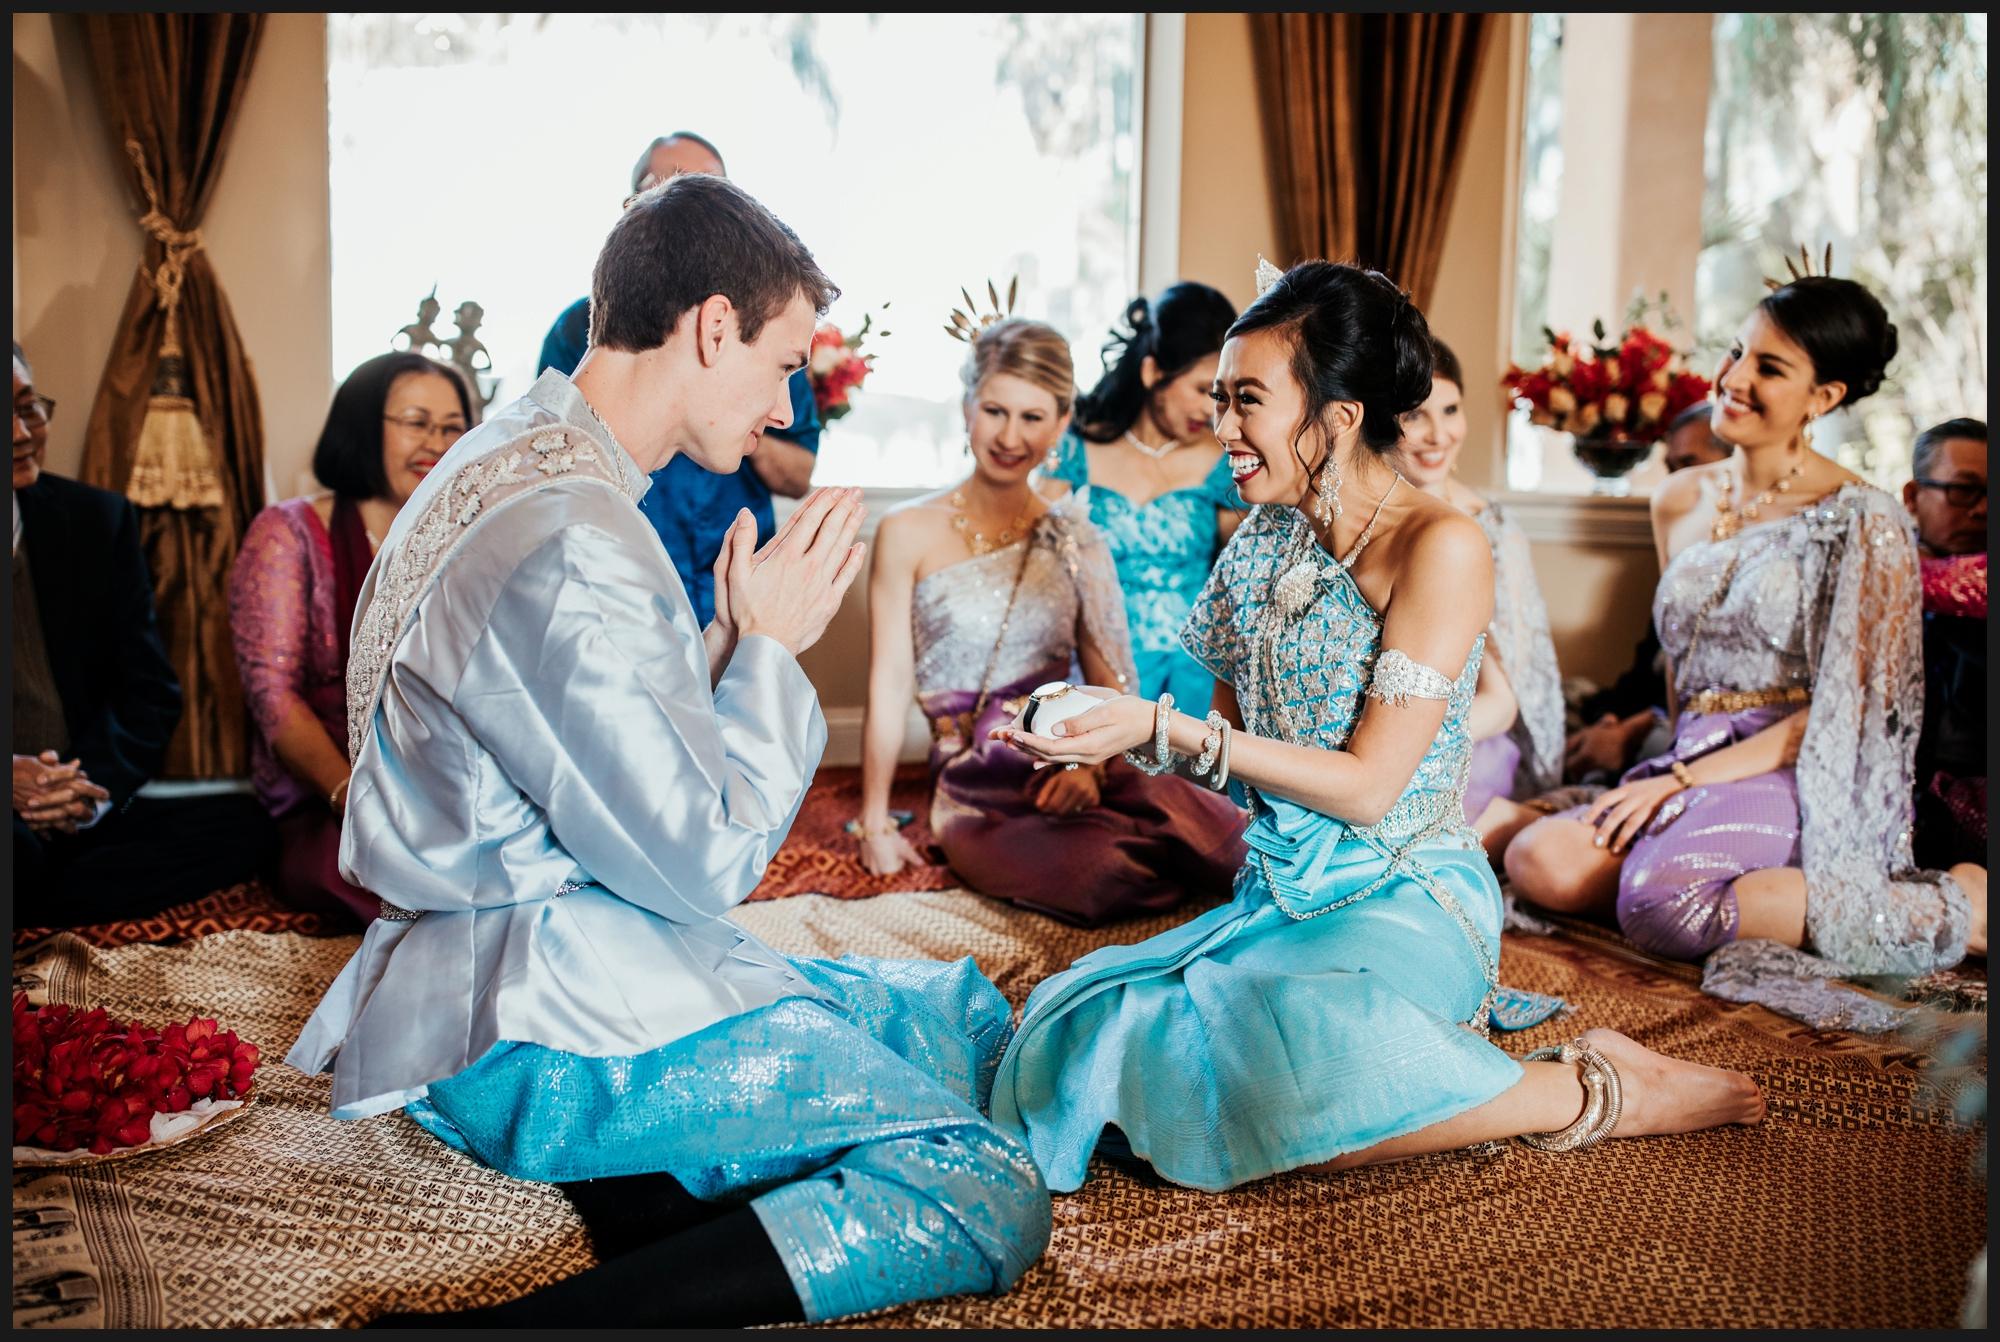 Orlando-Wedding-Photographer-destination-wedding-photographer-florida-wedding-photographer-bohemian-wedding-photographer_1368.jpg